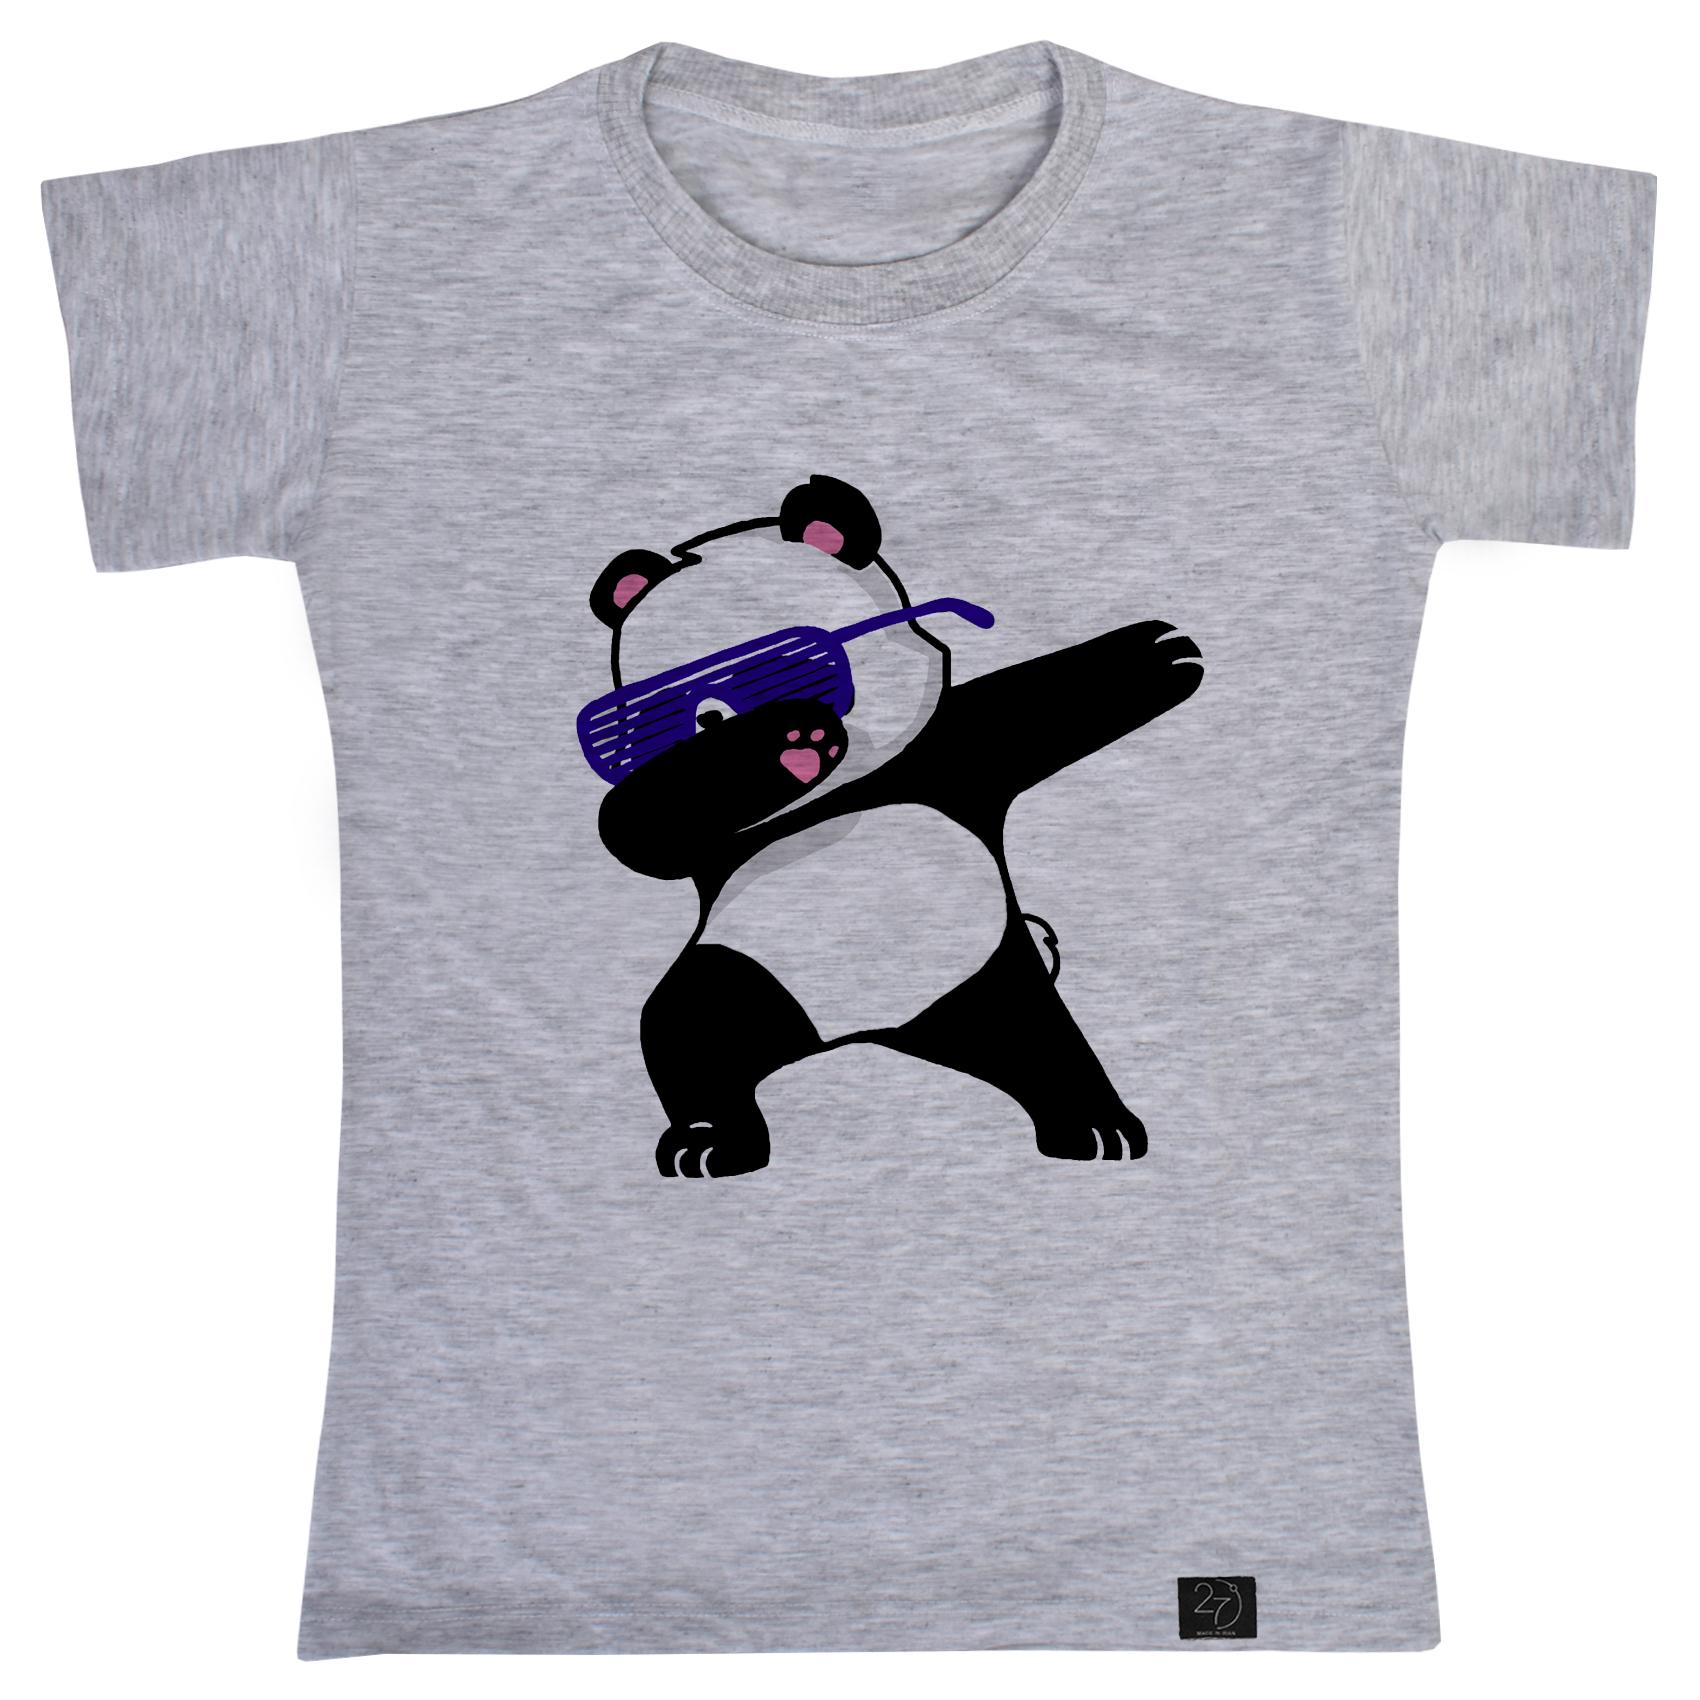 تی شرت پسرانه 27 طرح پاندا کد V07